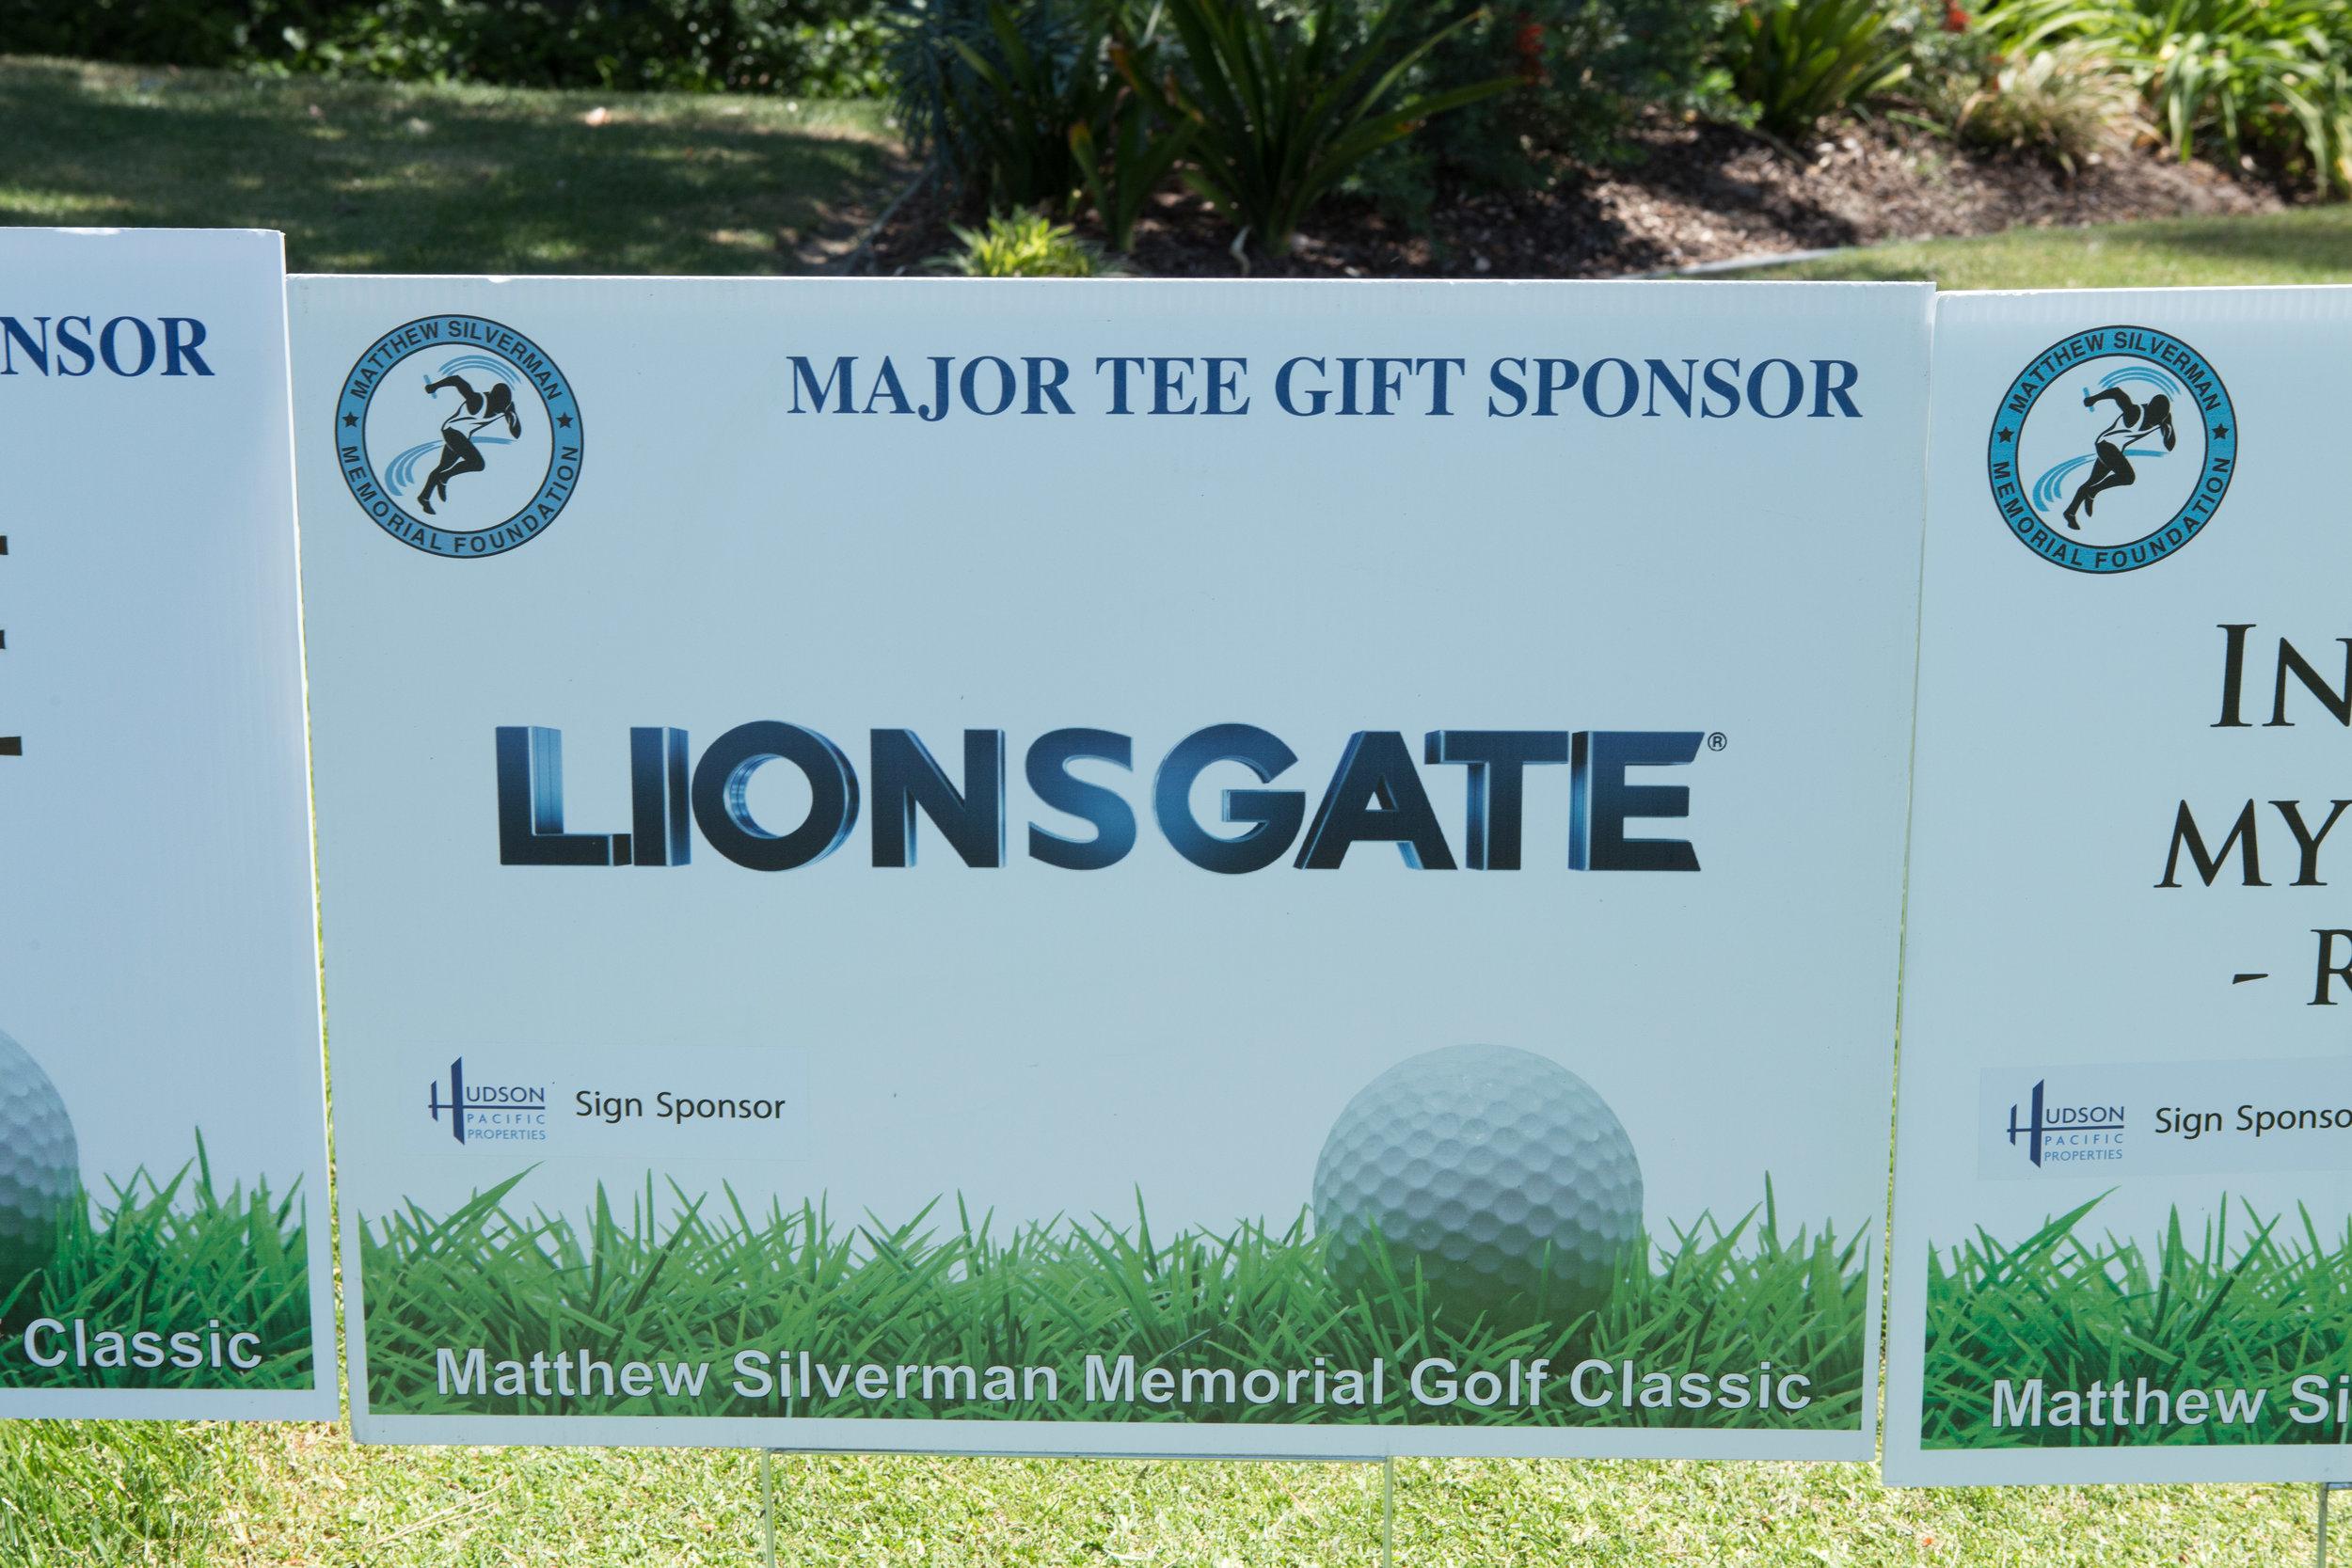 IMG_7934-SPONSOR SIGN-Lionsgate.jpg